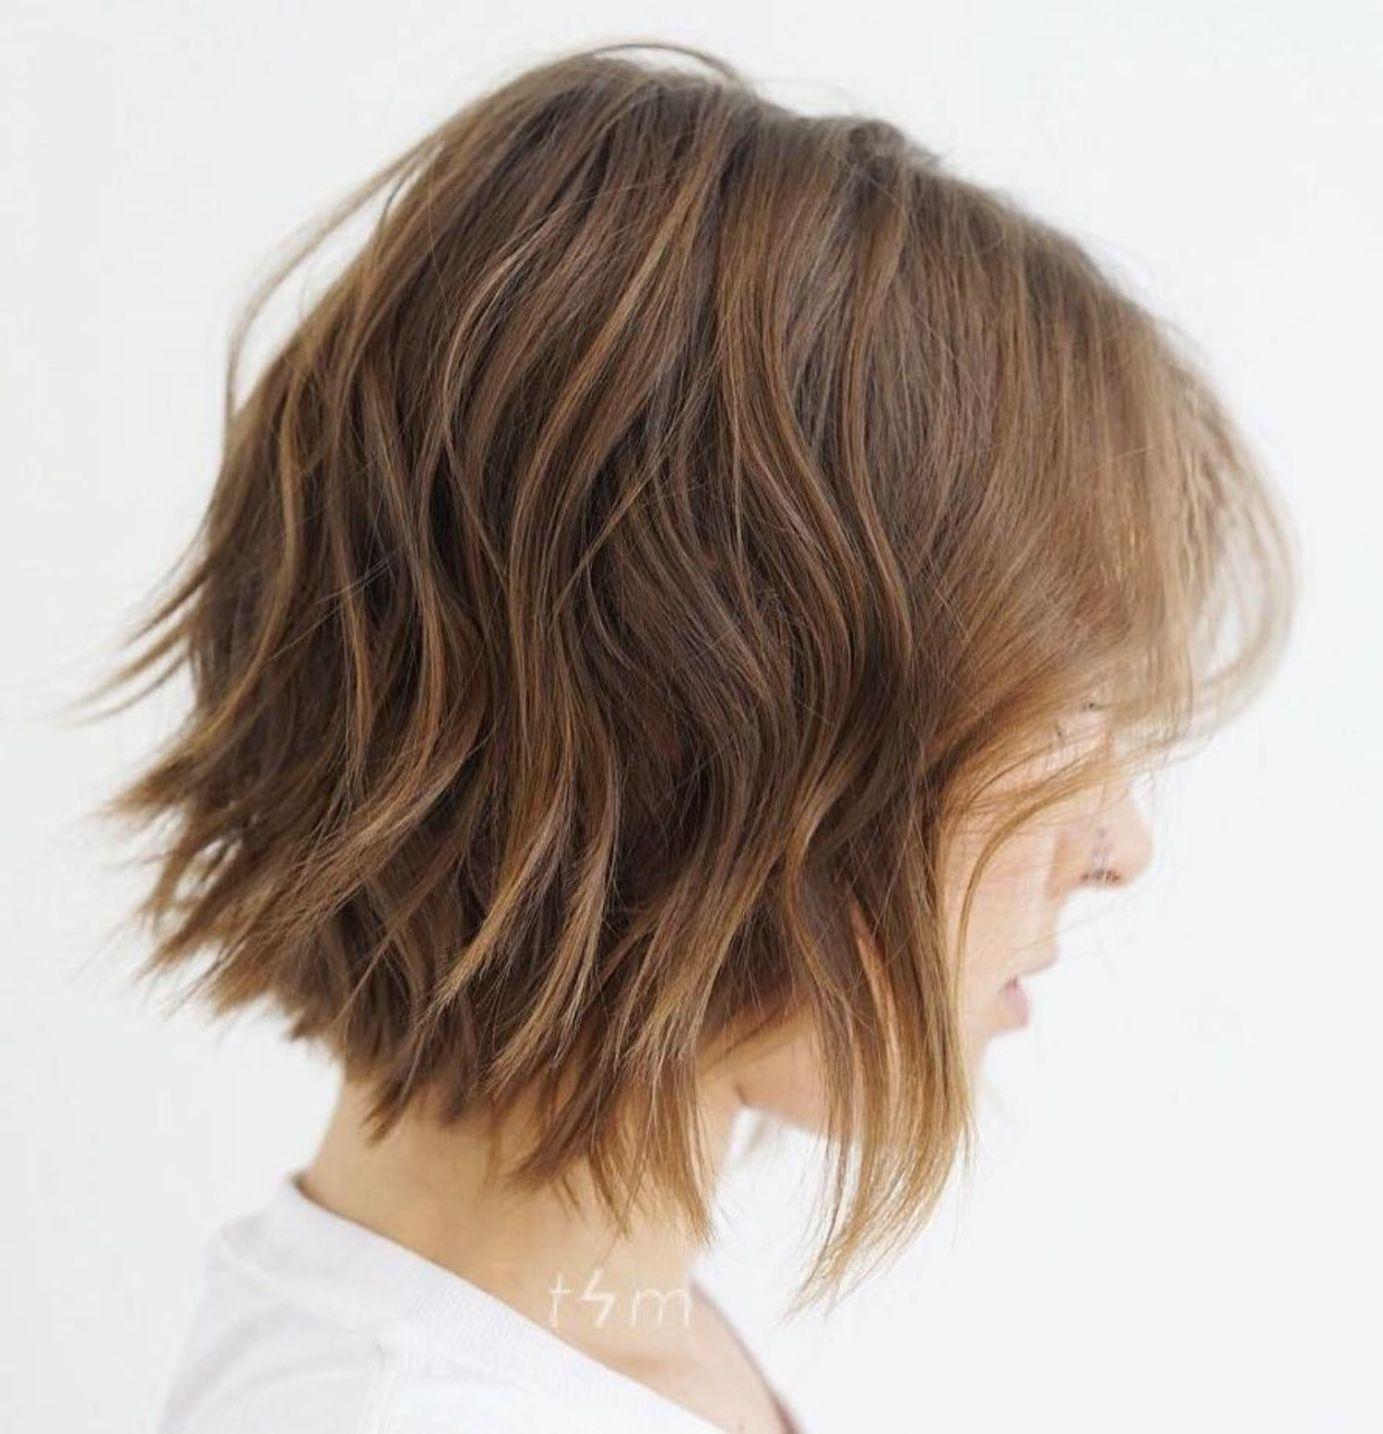 Choppy Wavy Bob For Fine Hair Kapsels Golvend Haar Kapsels Kapsel Halflang Golvend Haar